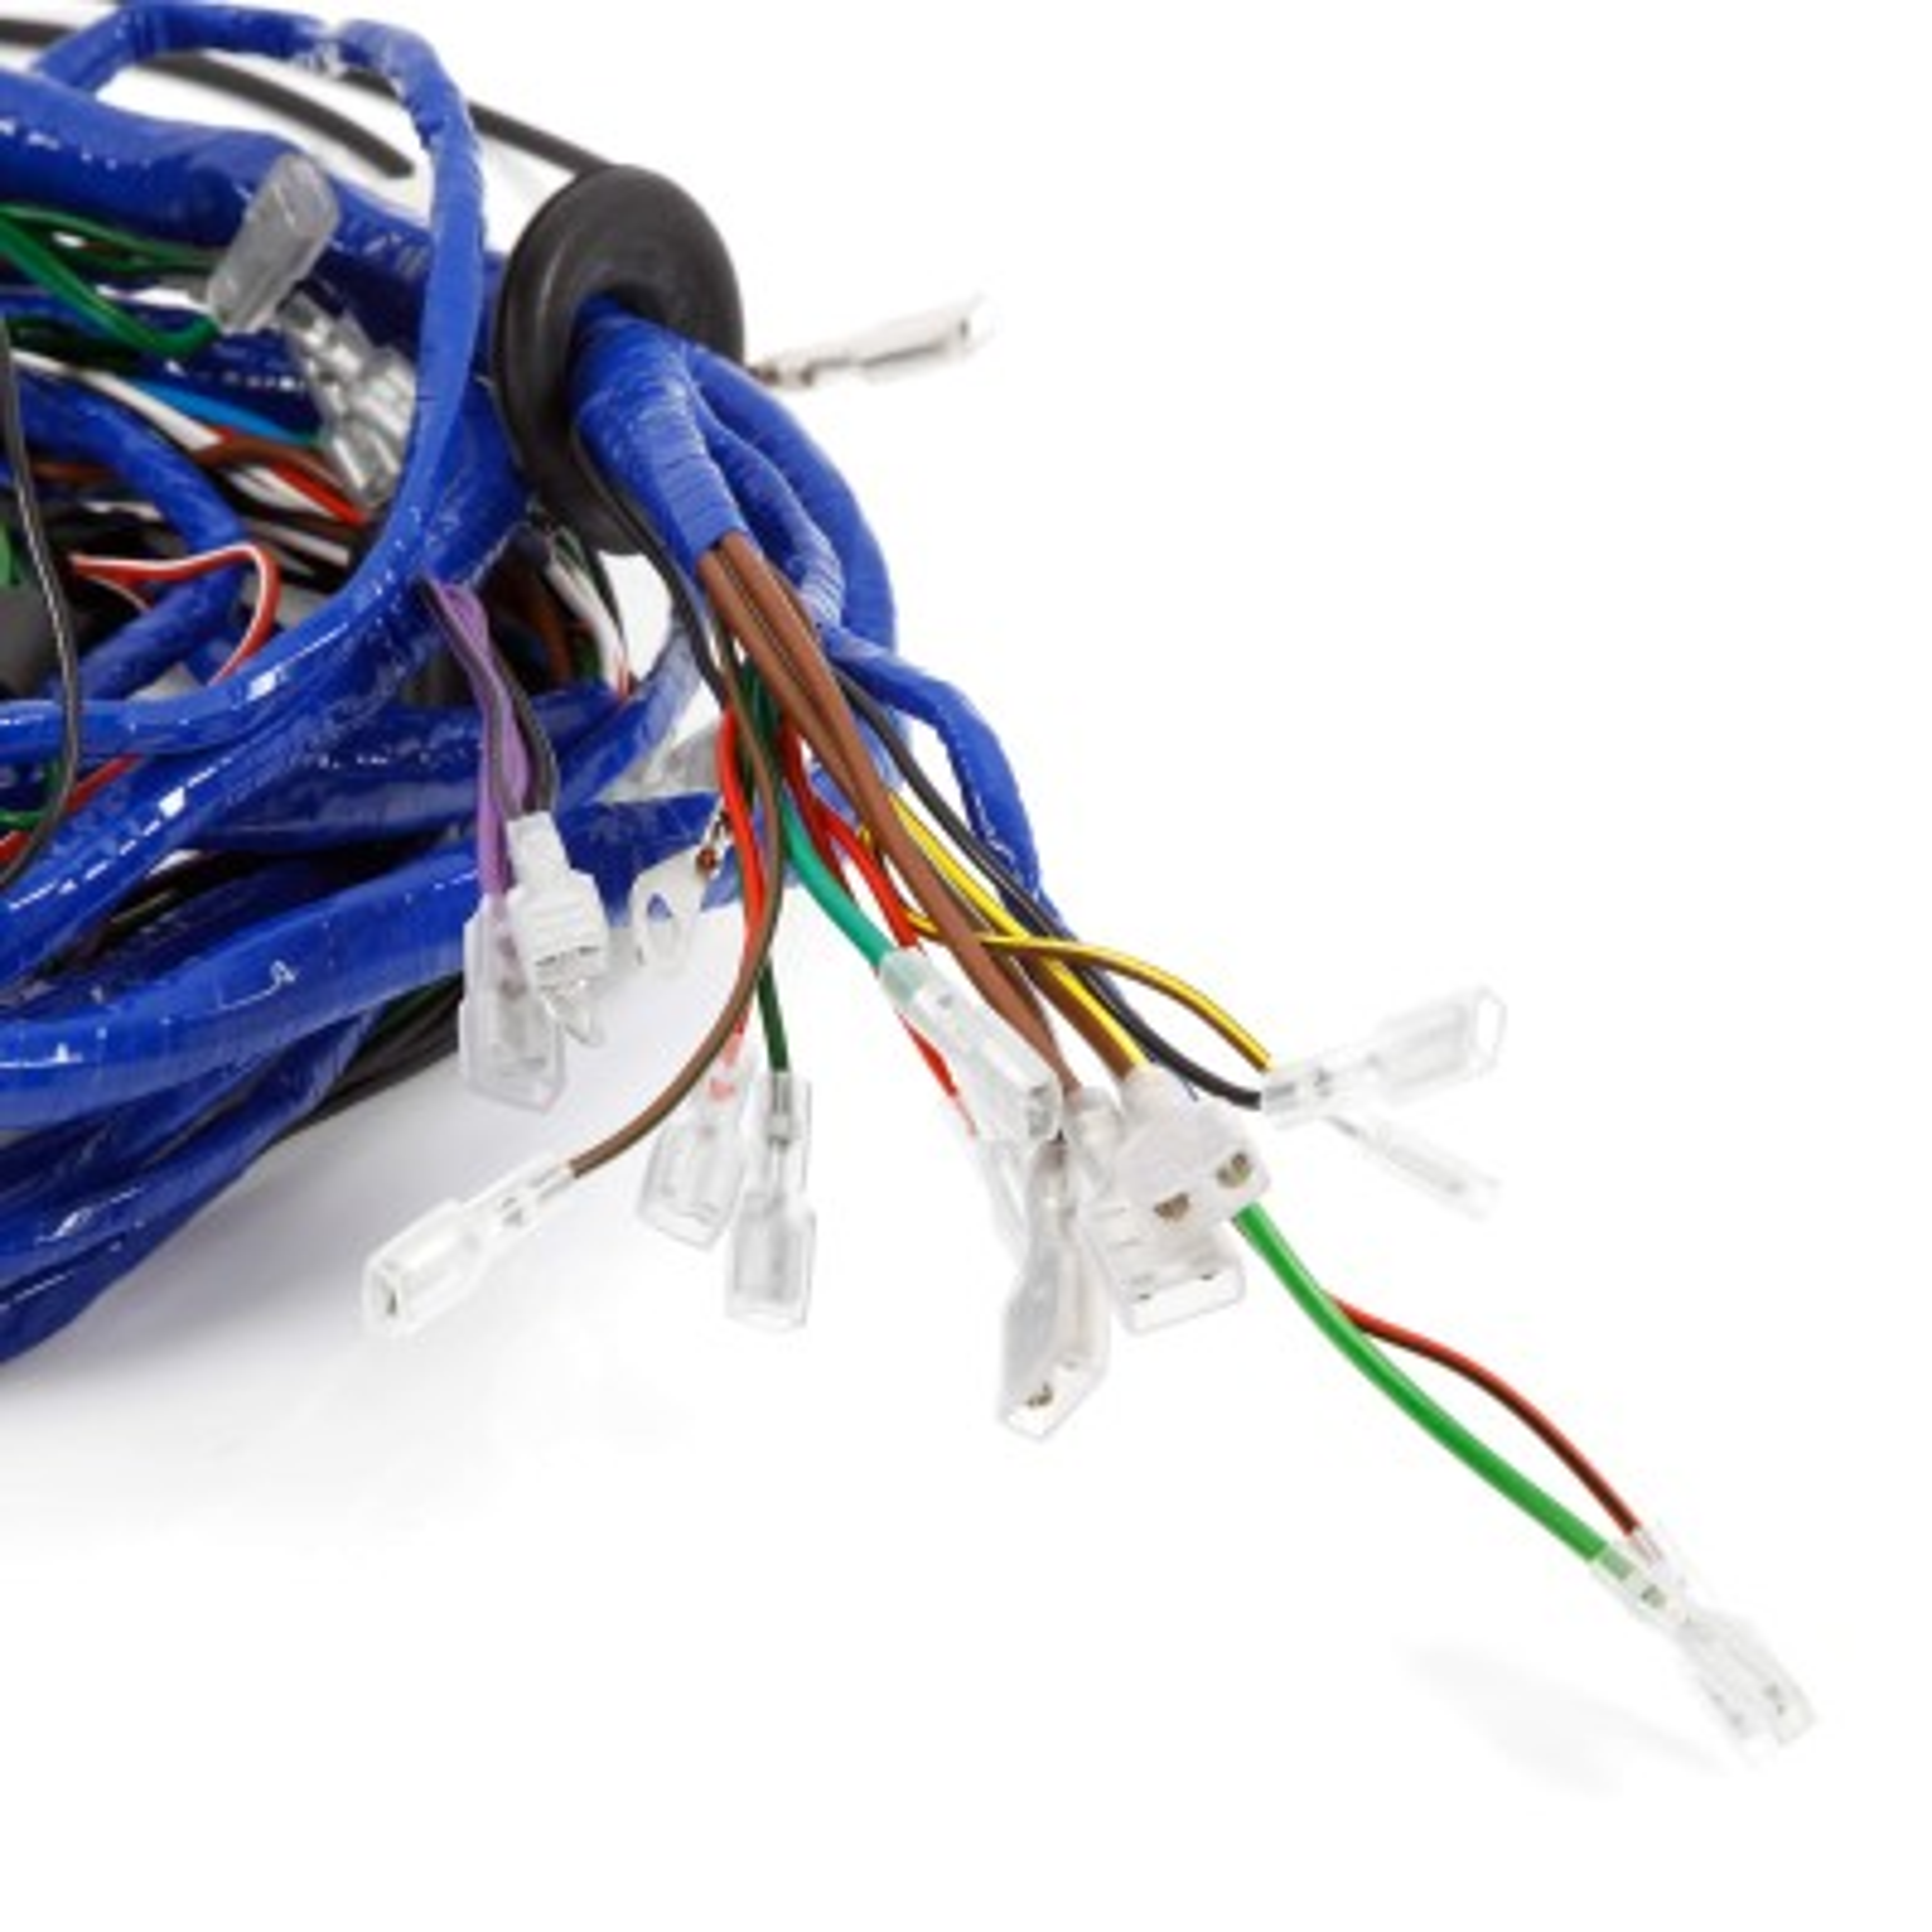 355 575 main harness, vinyl bound moss motors Wiring Harness 93A050059